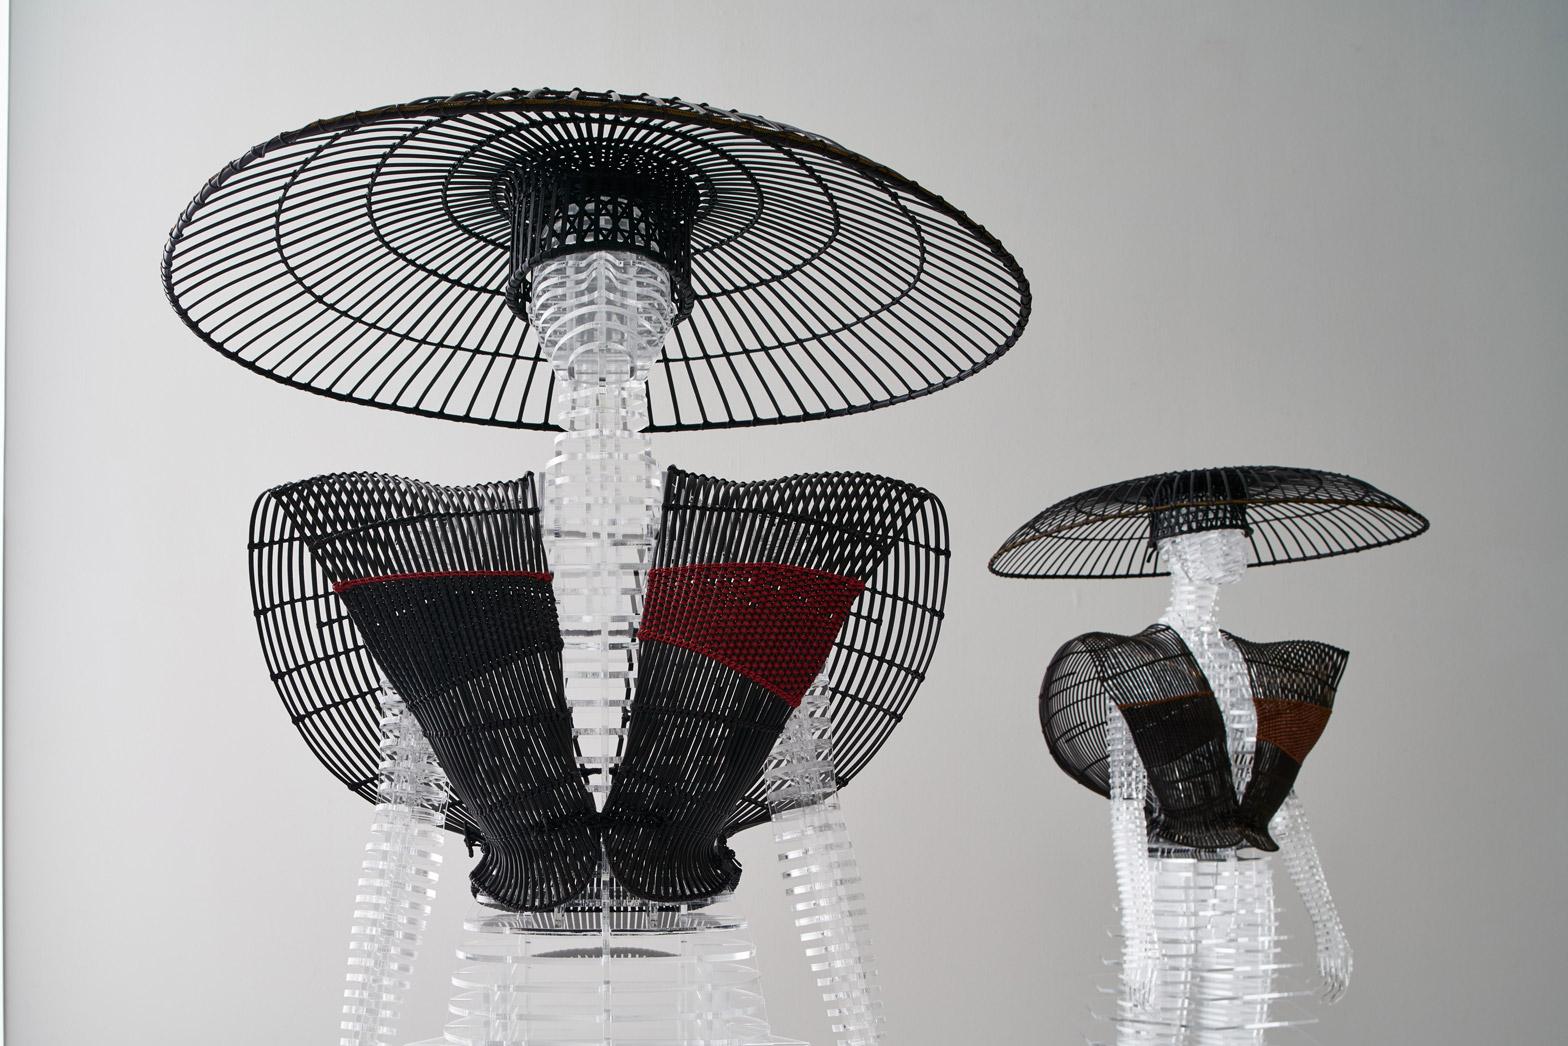 the-work-of-miyake-issey-exhibition-the-national-art-centre-tokyo_dezeen_1568_3.jpg